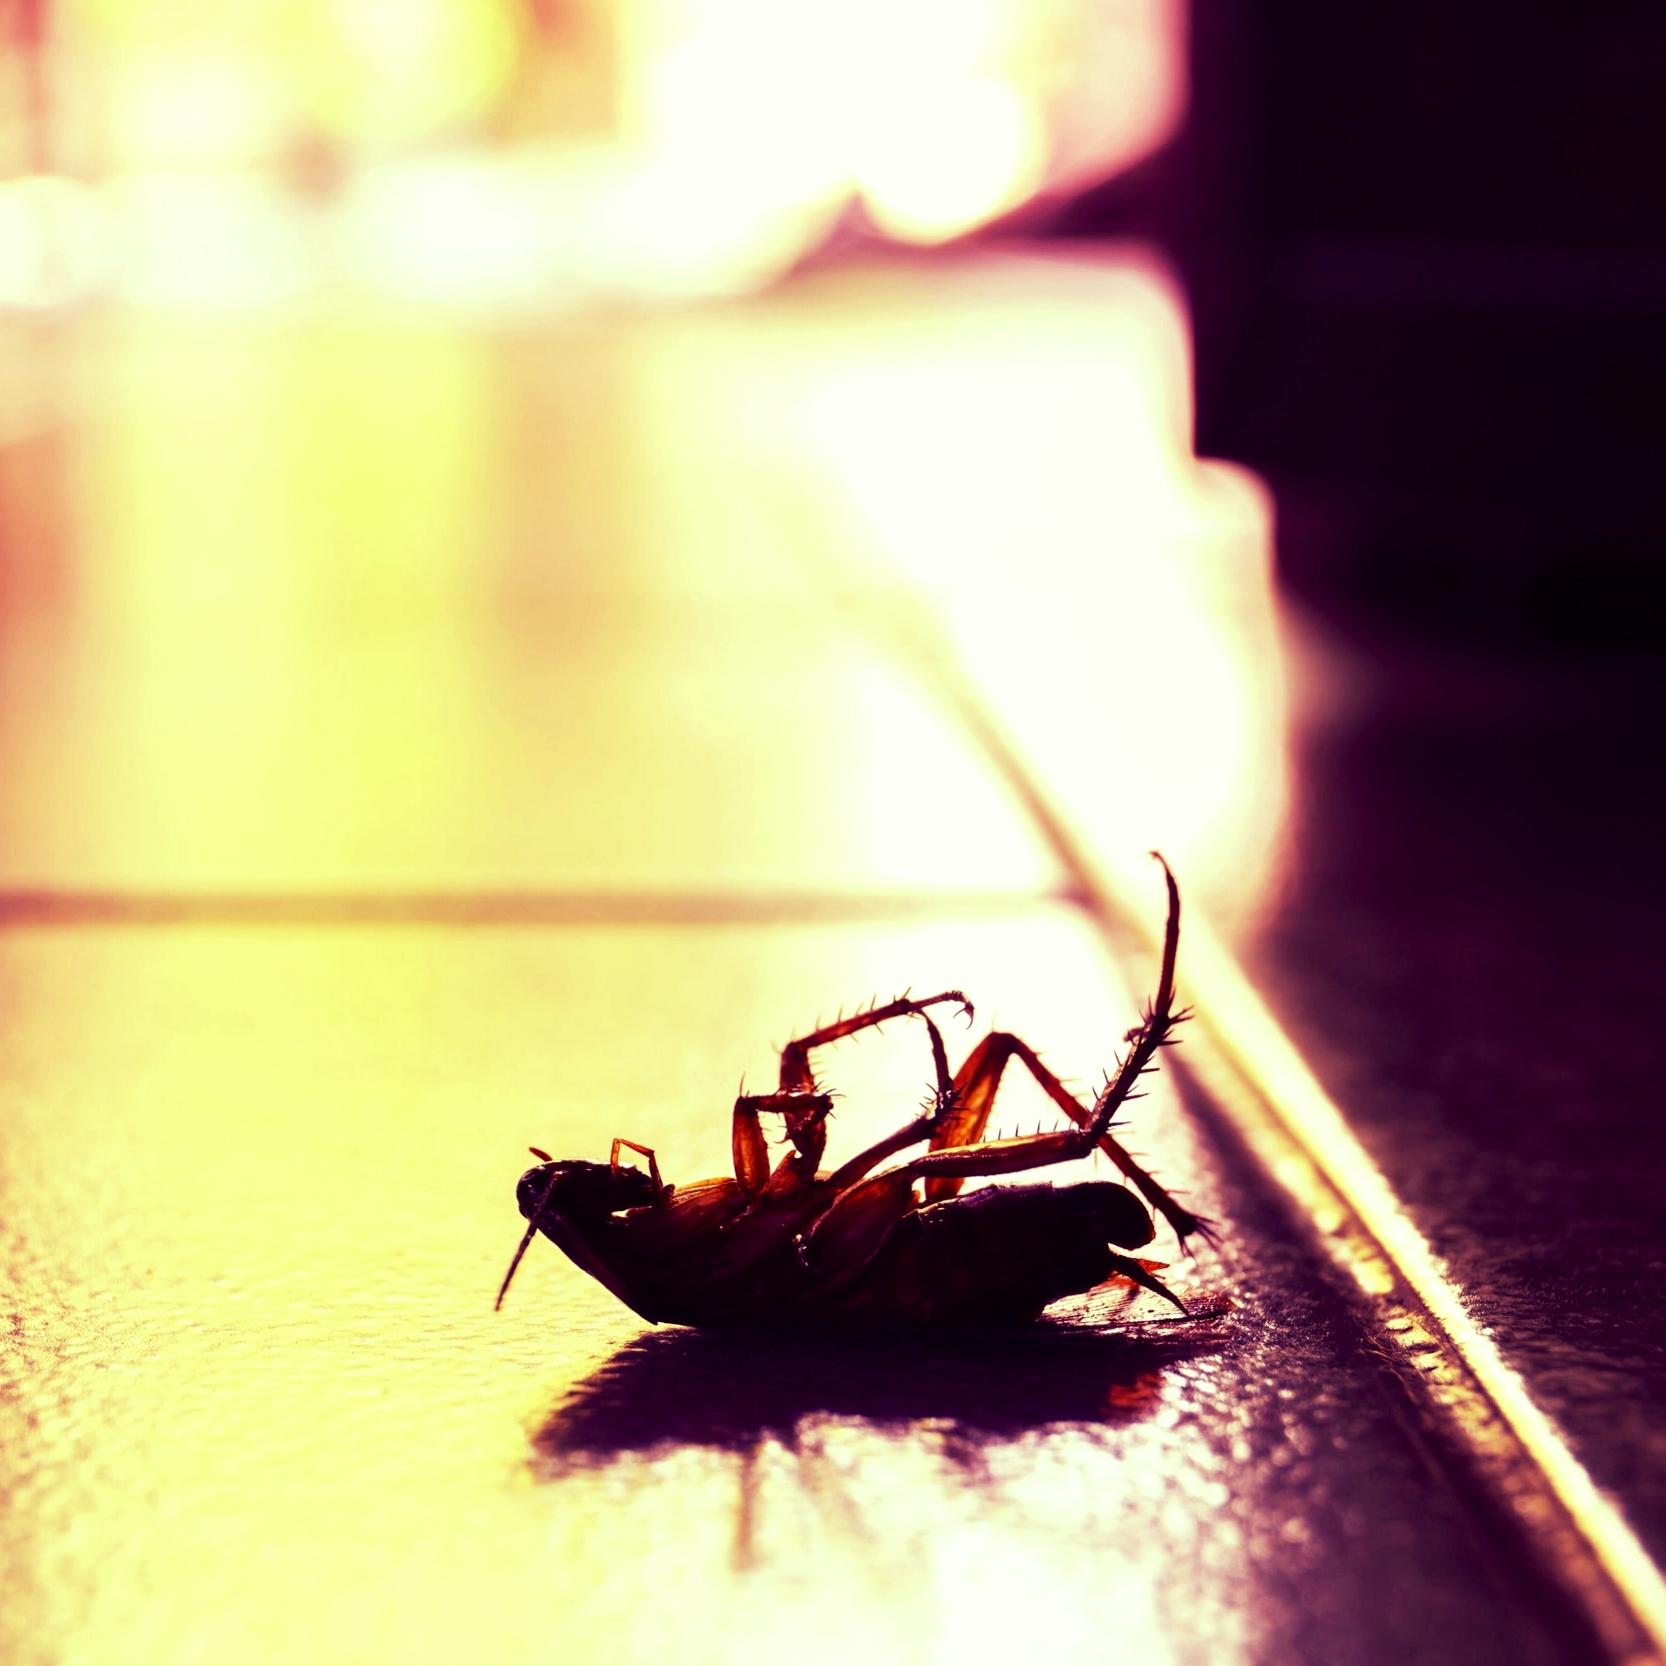 pest-control-rid-eliminate-bugs